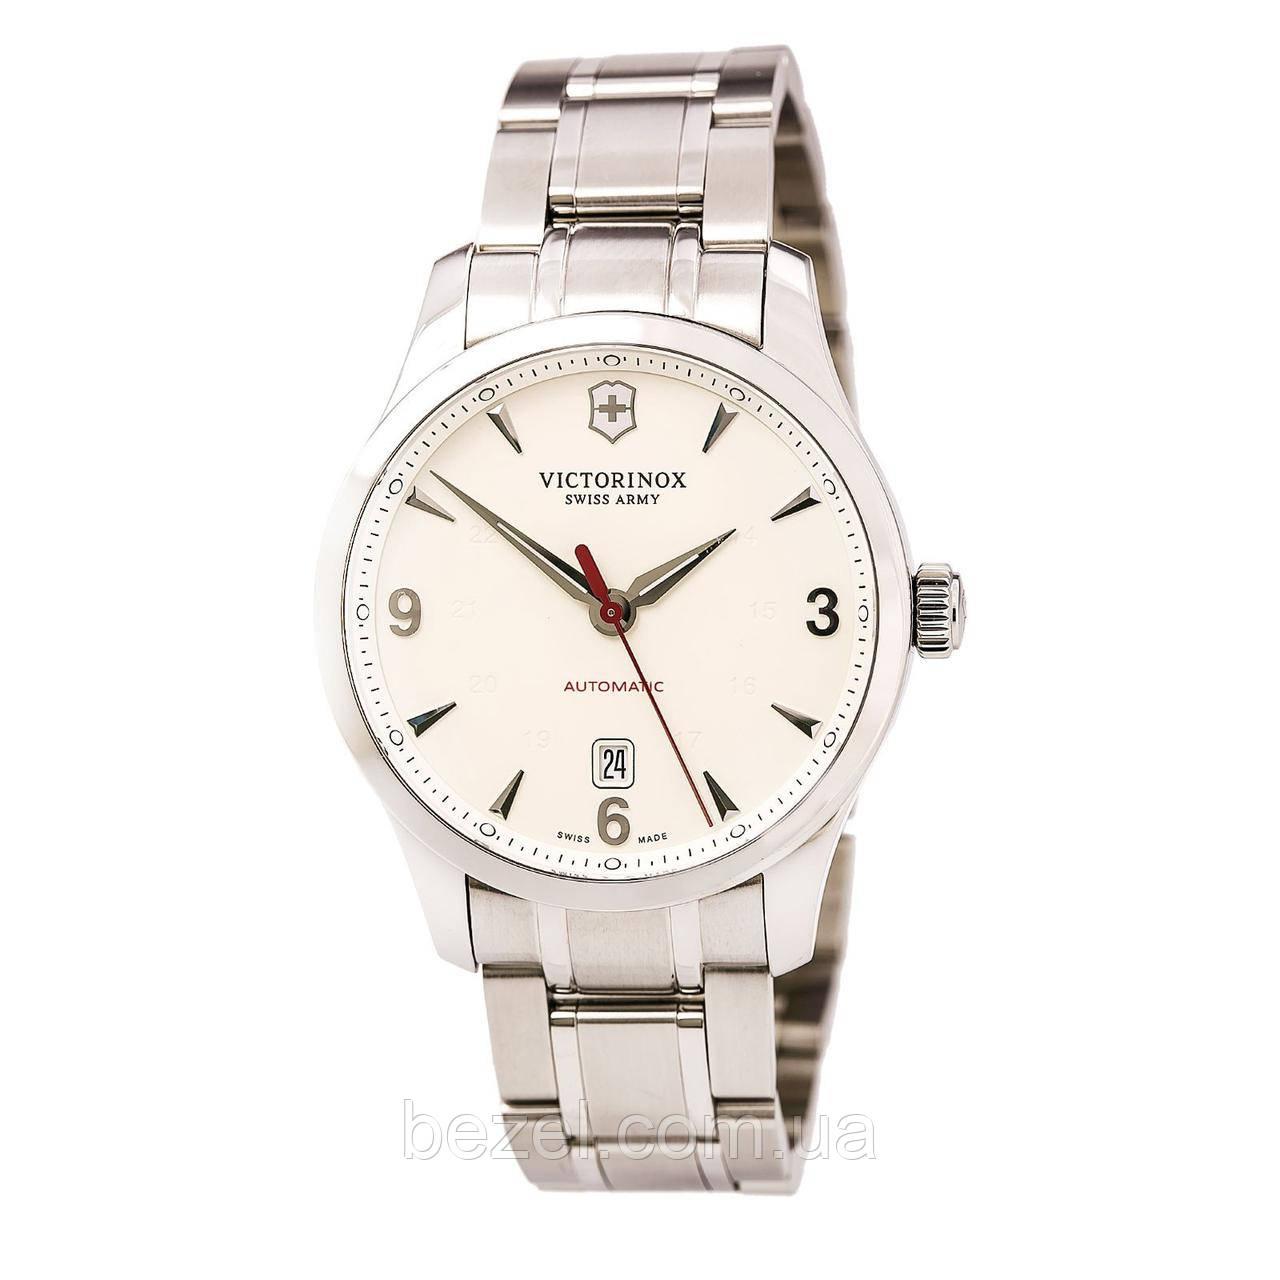 d8e0b163 Мужские часы Victorinox Swiss Army 241667 Automatic : продажа, цена ...